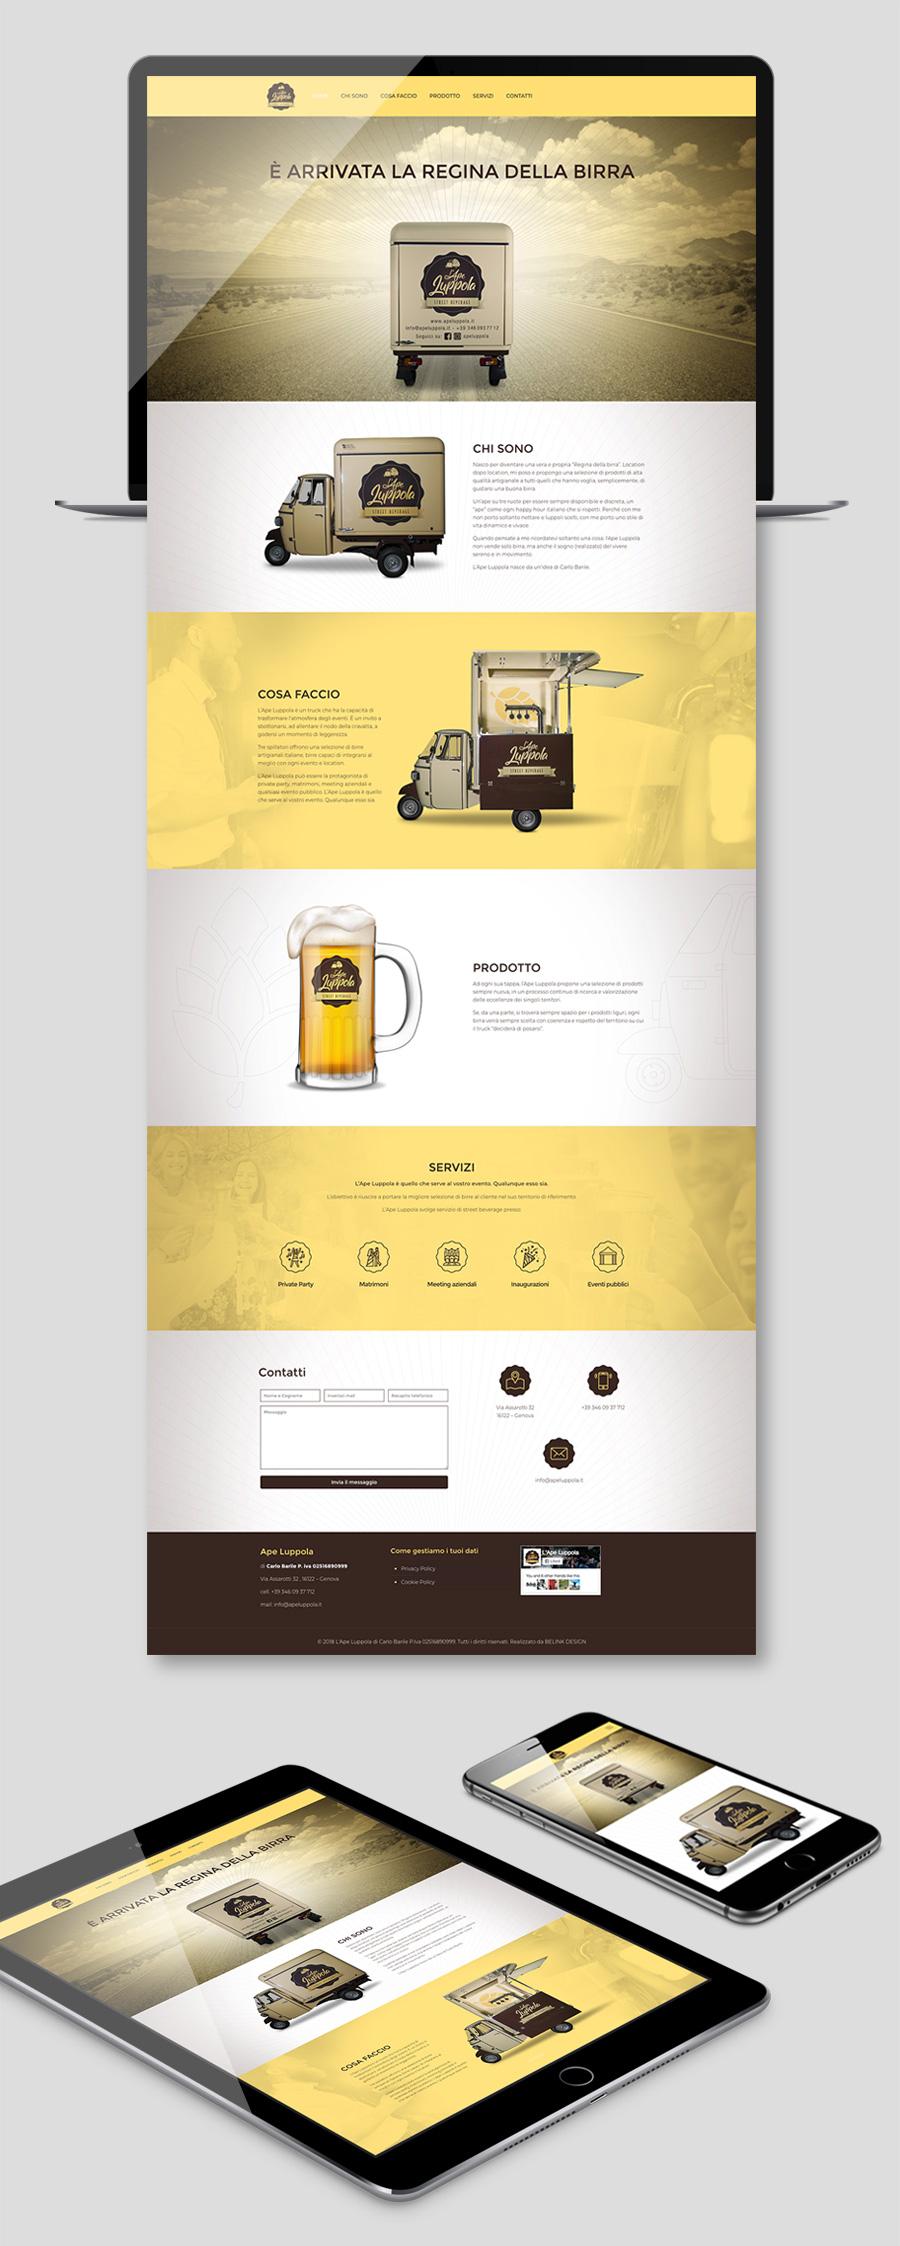 belink-design-ape-luppola-sito-web-responsive